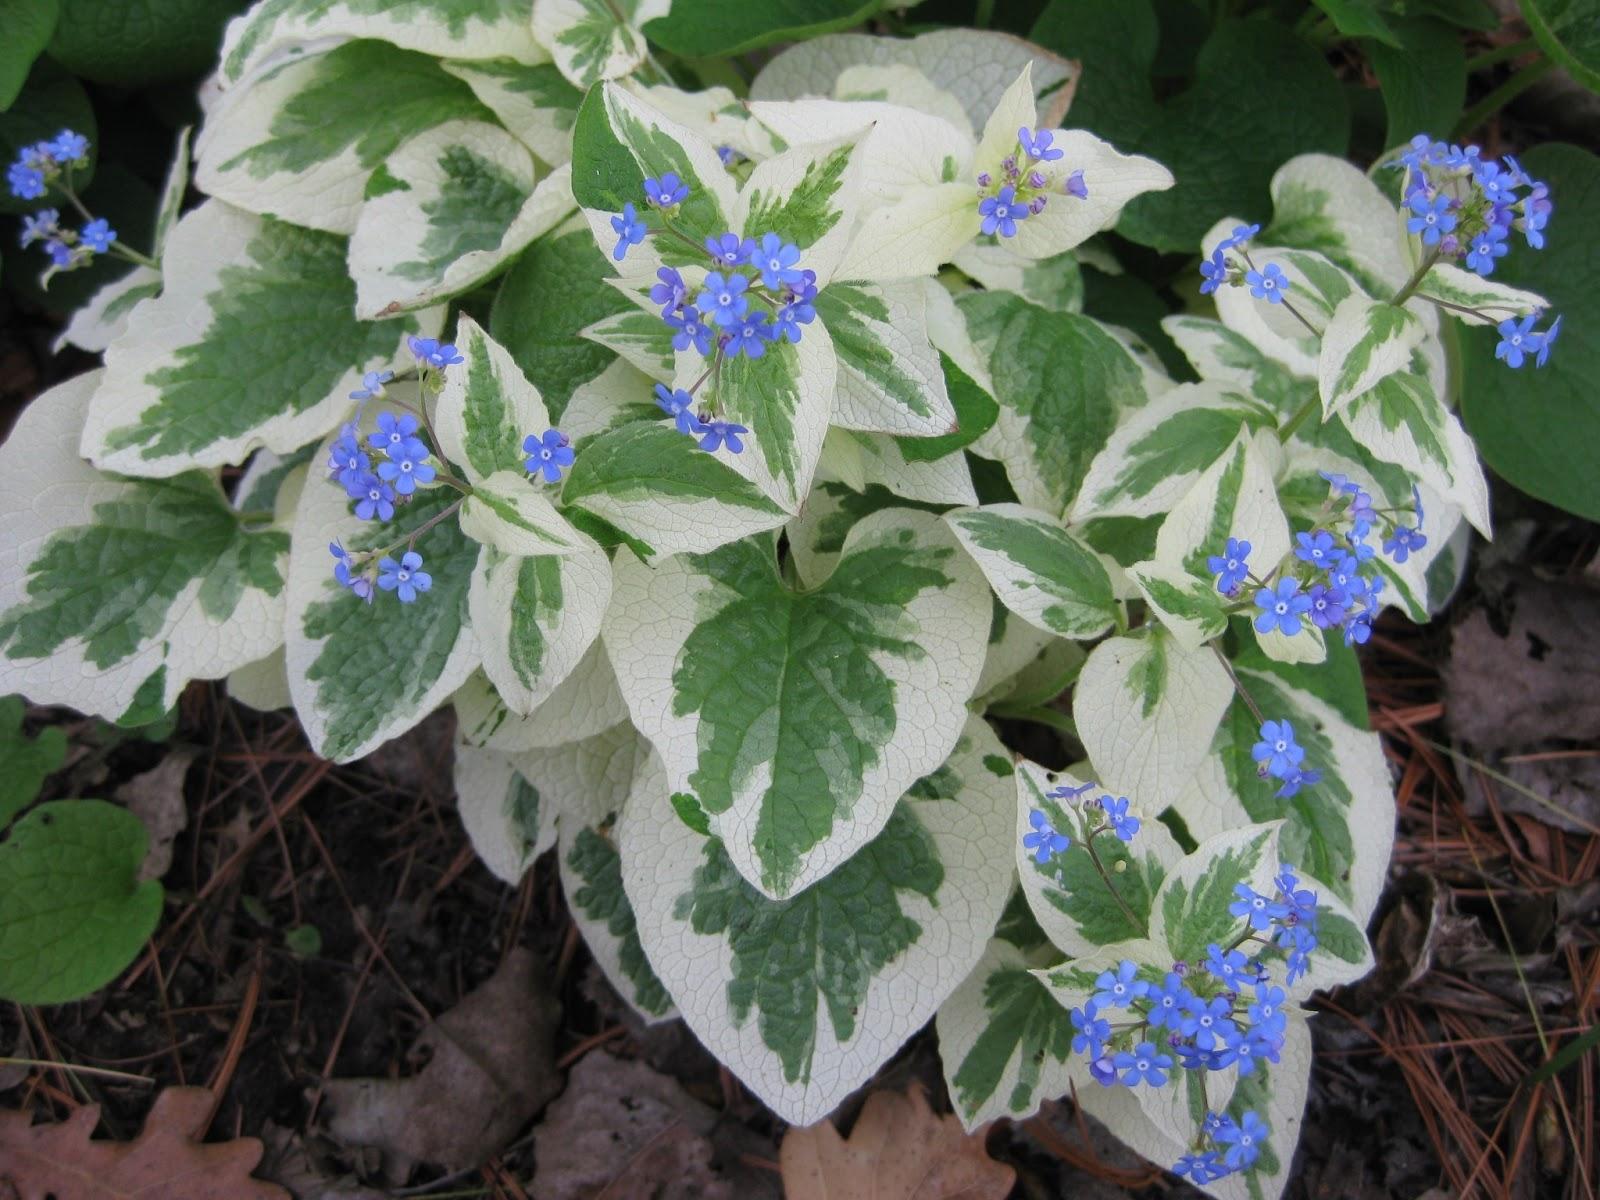 Brunnera macrophylla variegata